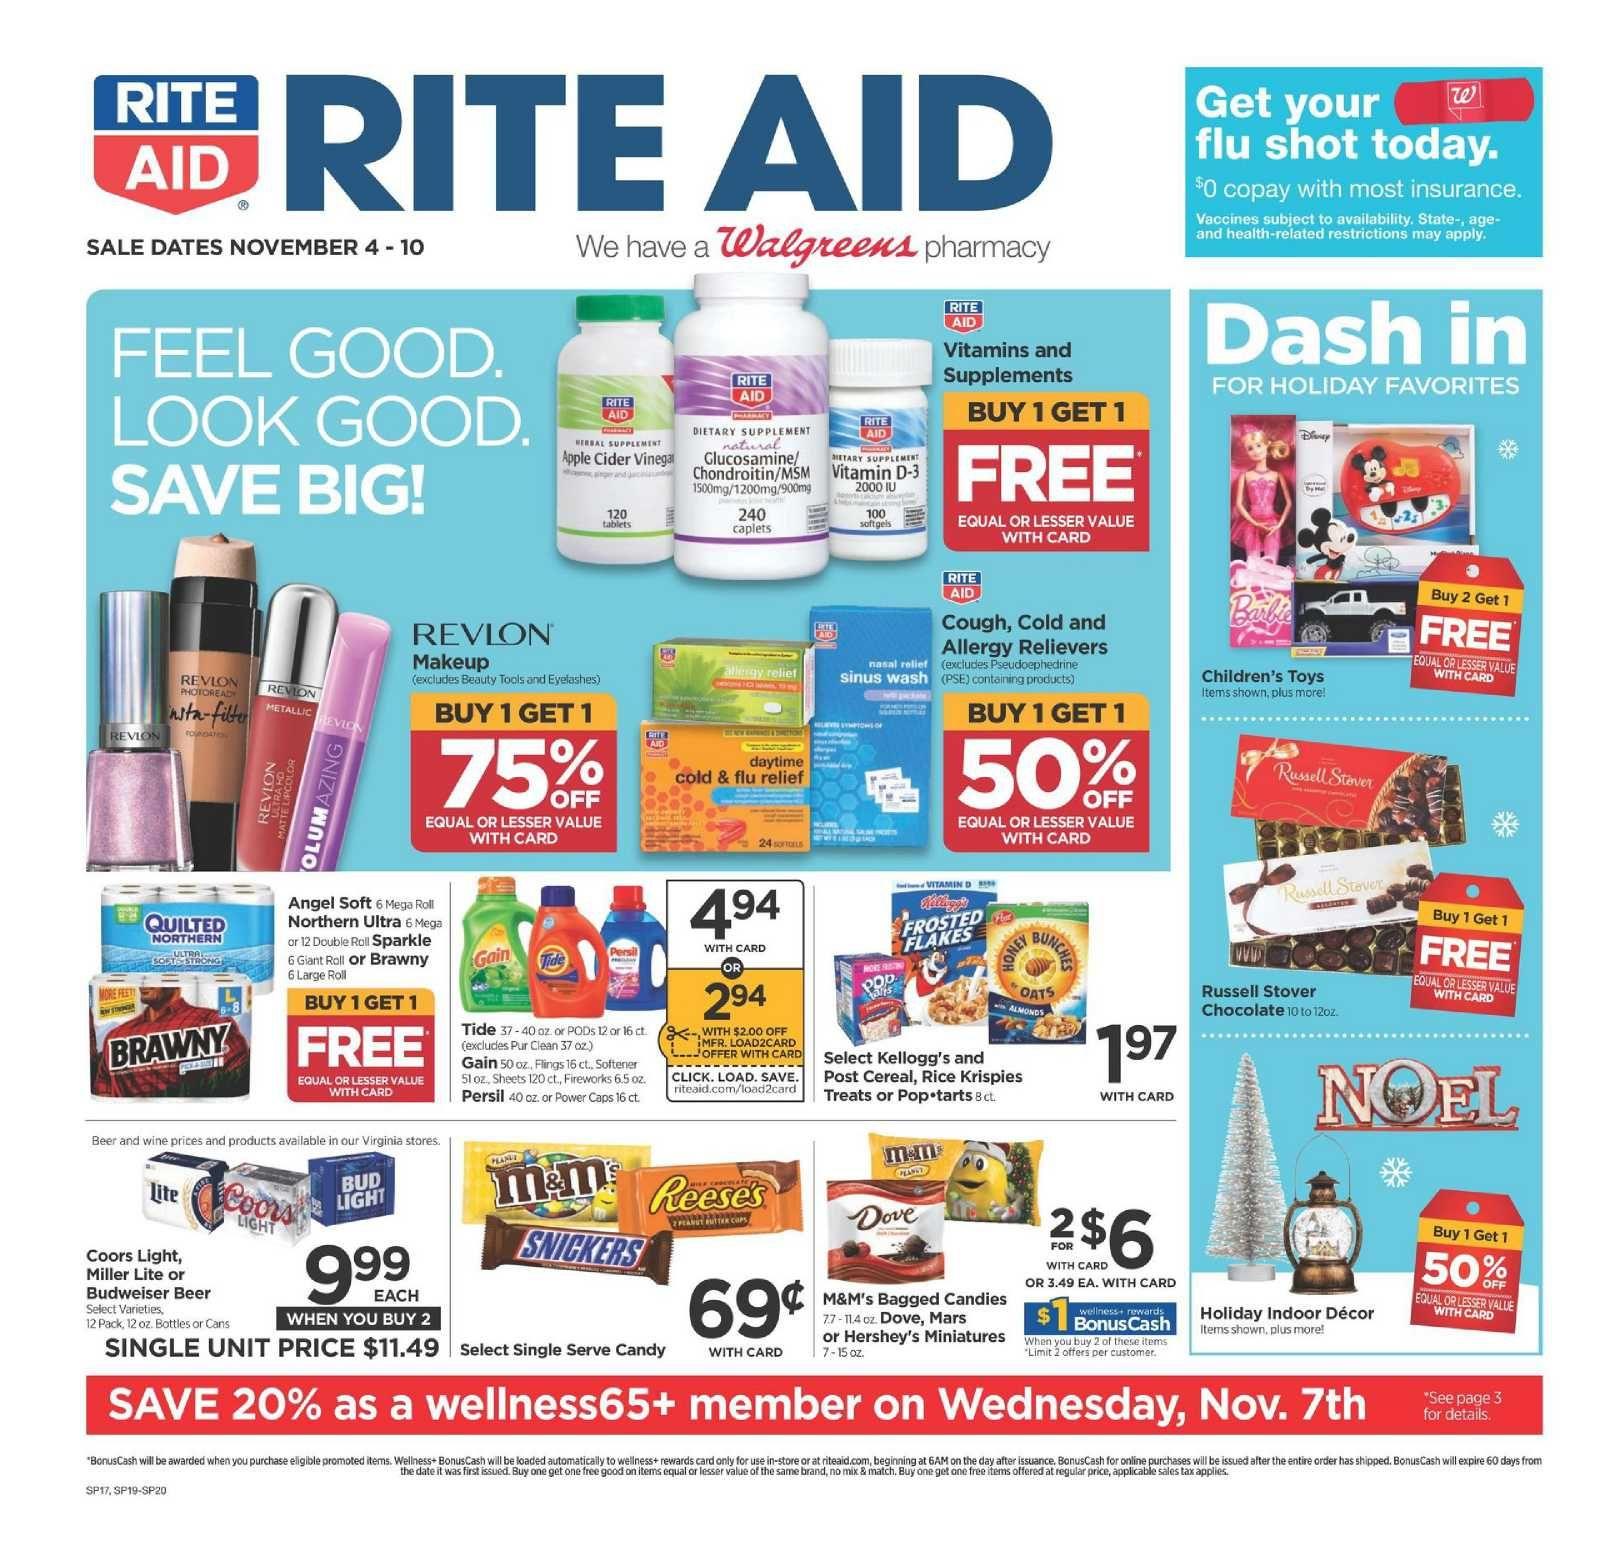 Rite Aid Weekly Ad Flyer May 30 June 5 2021 Weeklyad123 Com Weekly Ad Circular Grocery Stores Rite Aid Weekly Ads Diet Rite